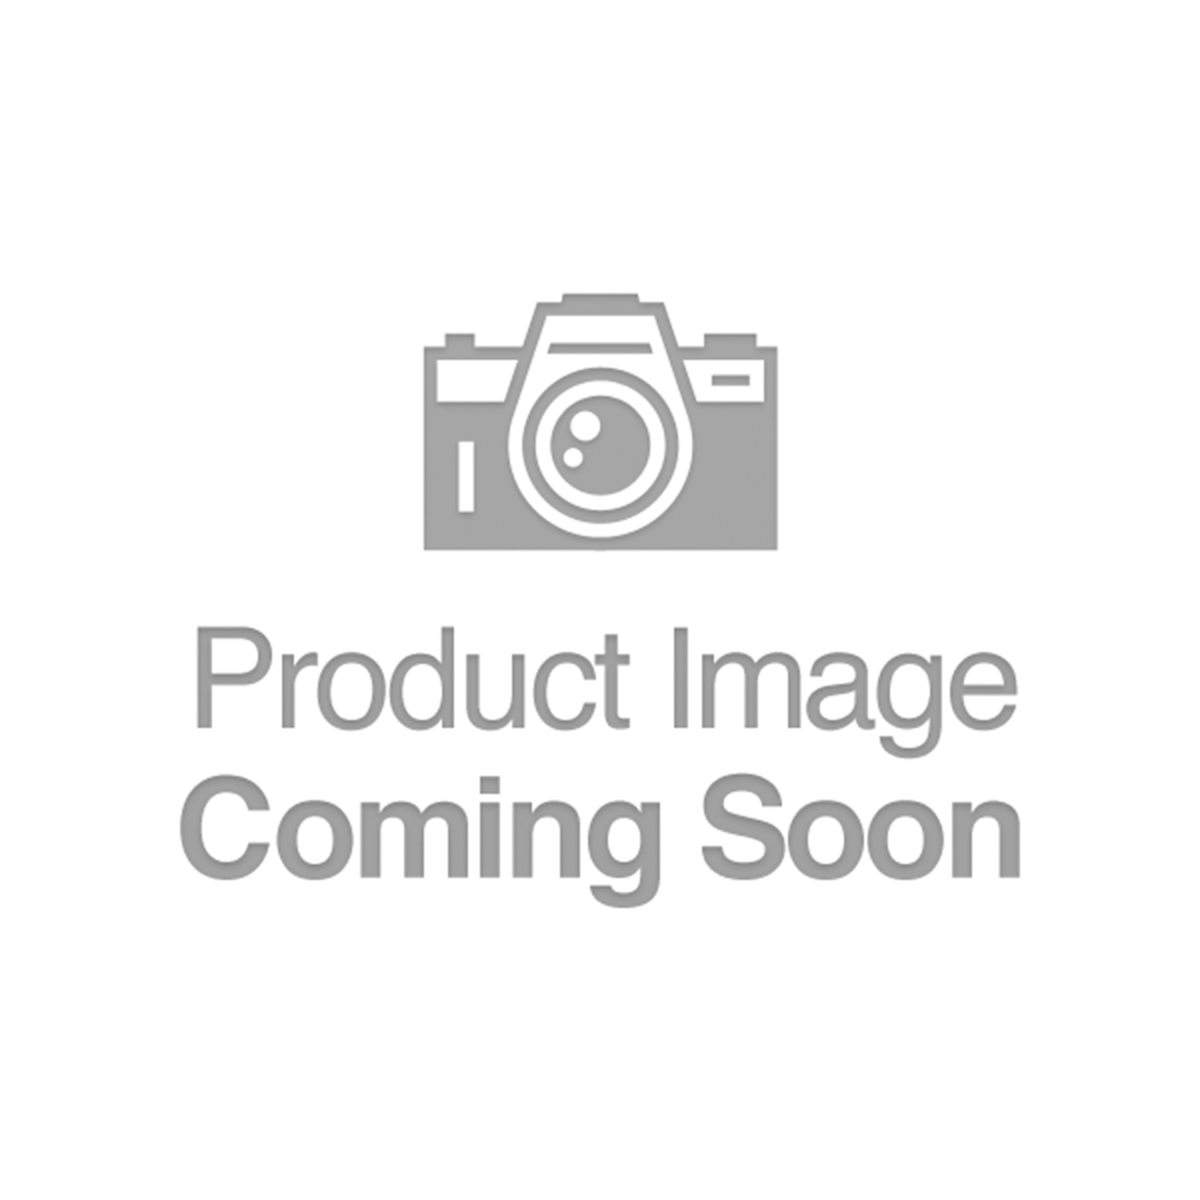 FR. MA-161 4 Shillings Massachusetts Colonial Note PCGS 63